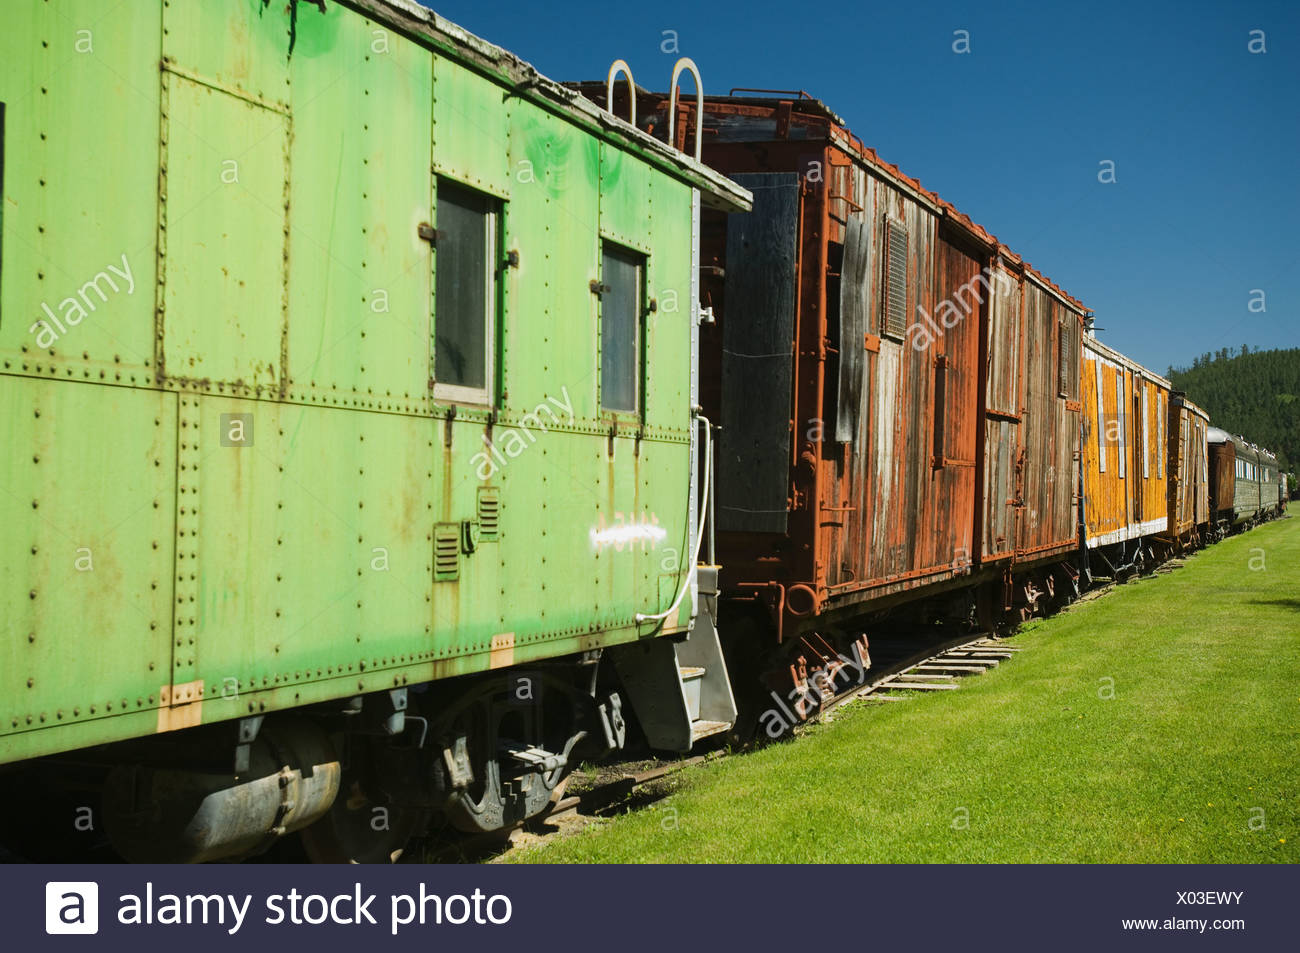 Abandoned freight train - Stock Image